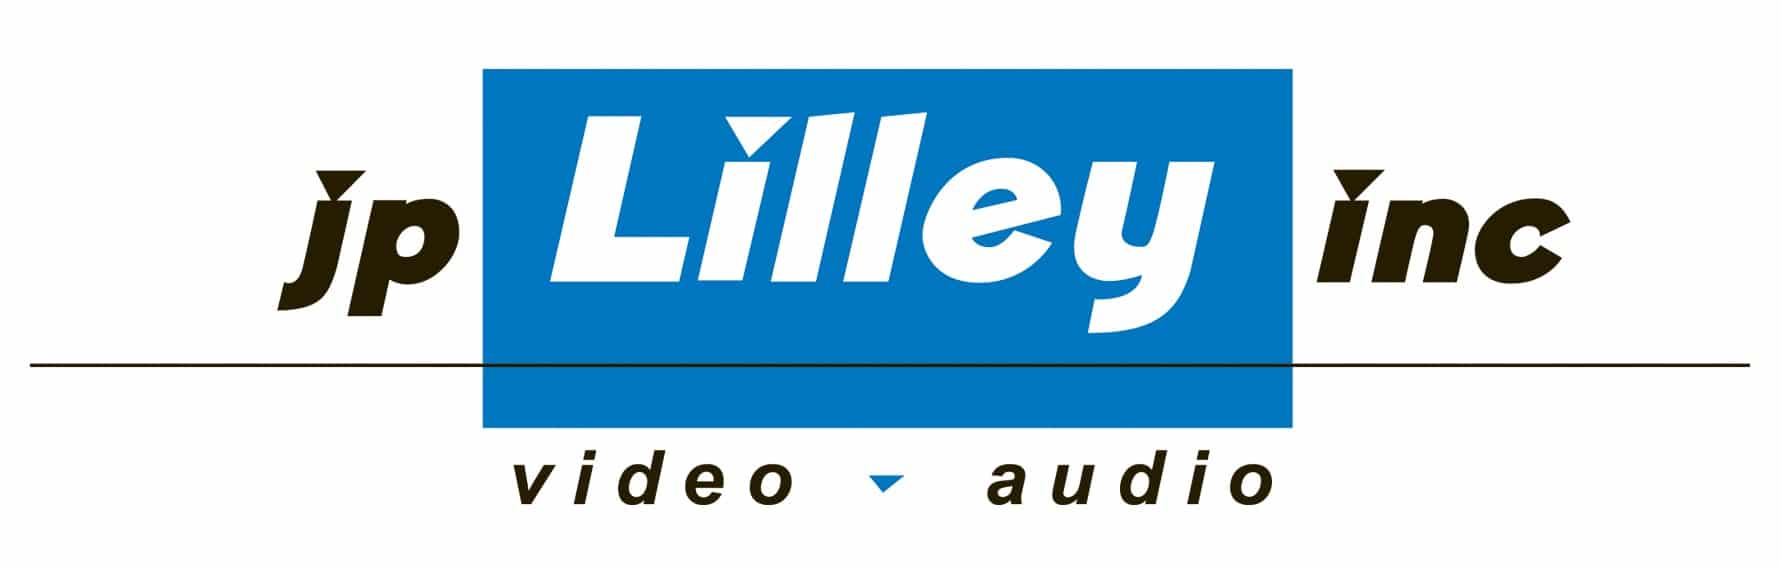 JP Lilley - Community Level